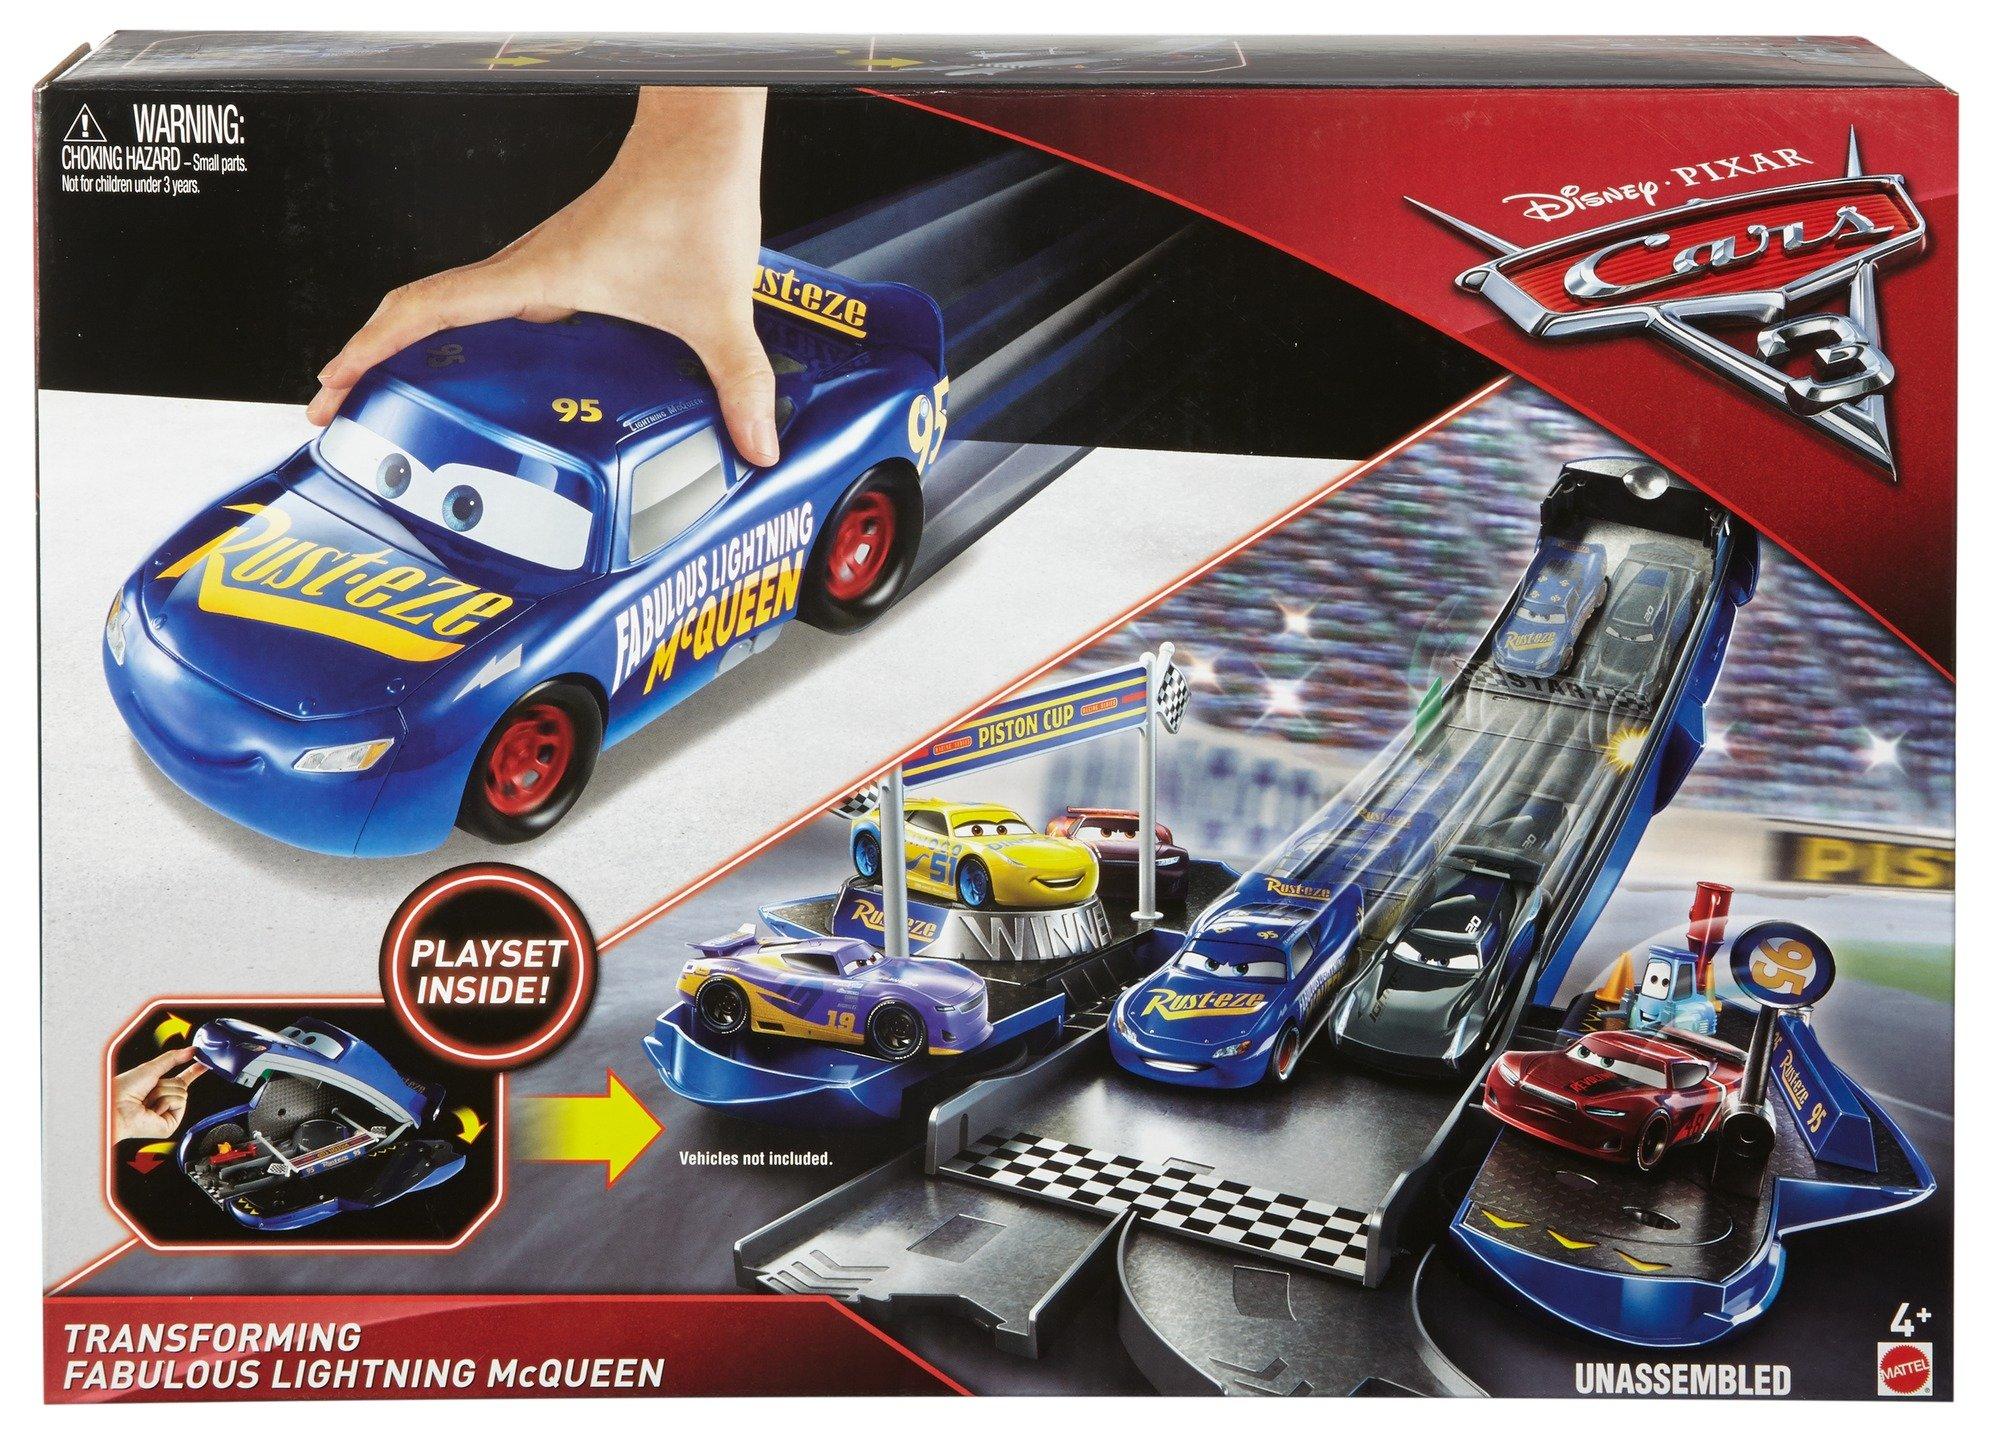 Disney/Pixar Cars 3 Transforming Fabulous Lightning McQueen Playset